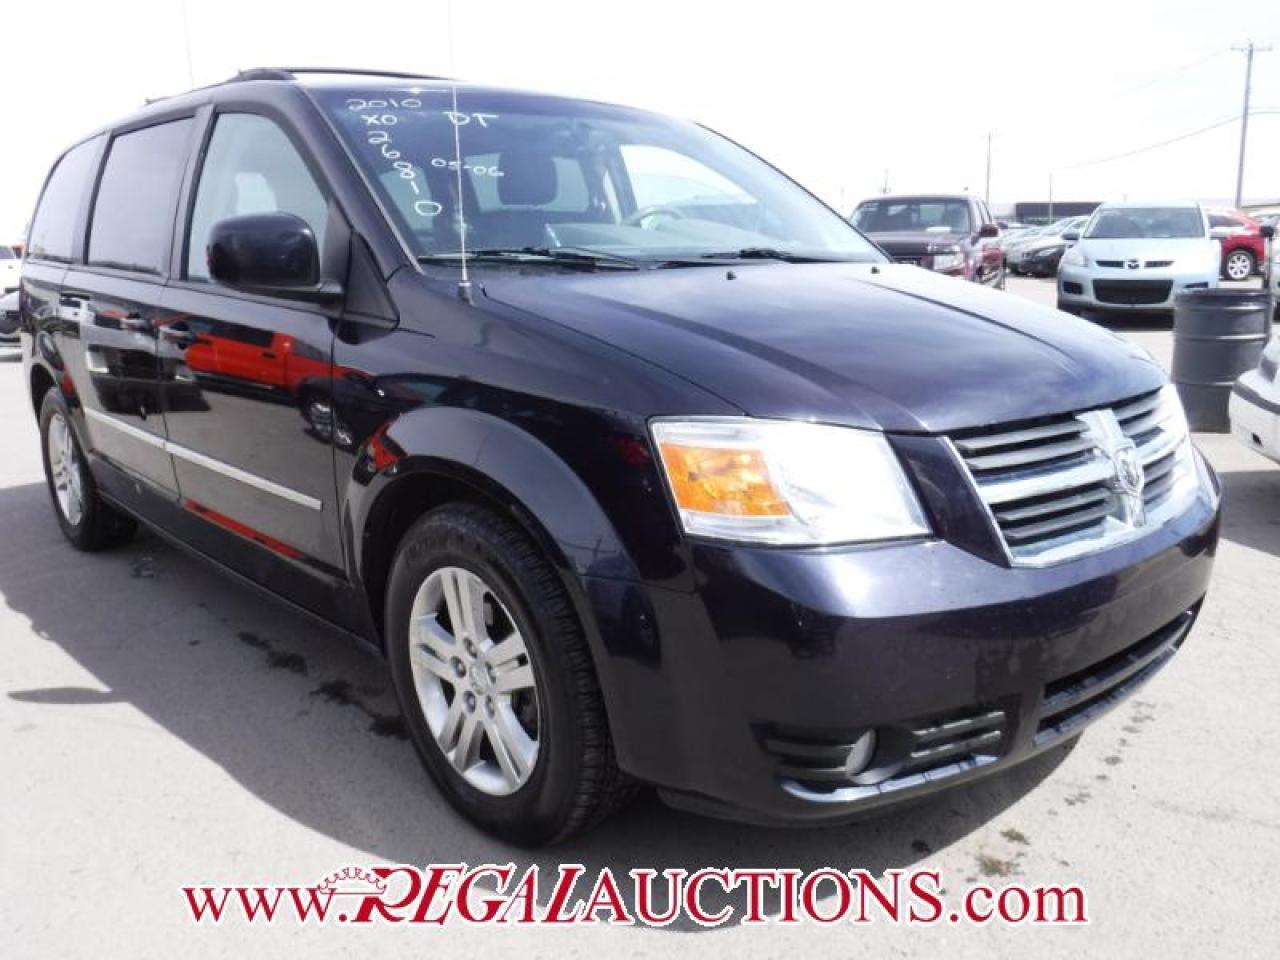 Toyota Dealer Lincoln Ne Used 2010 Dodge GRAND CARAVAN WAGON for Sale in Calgary ...